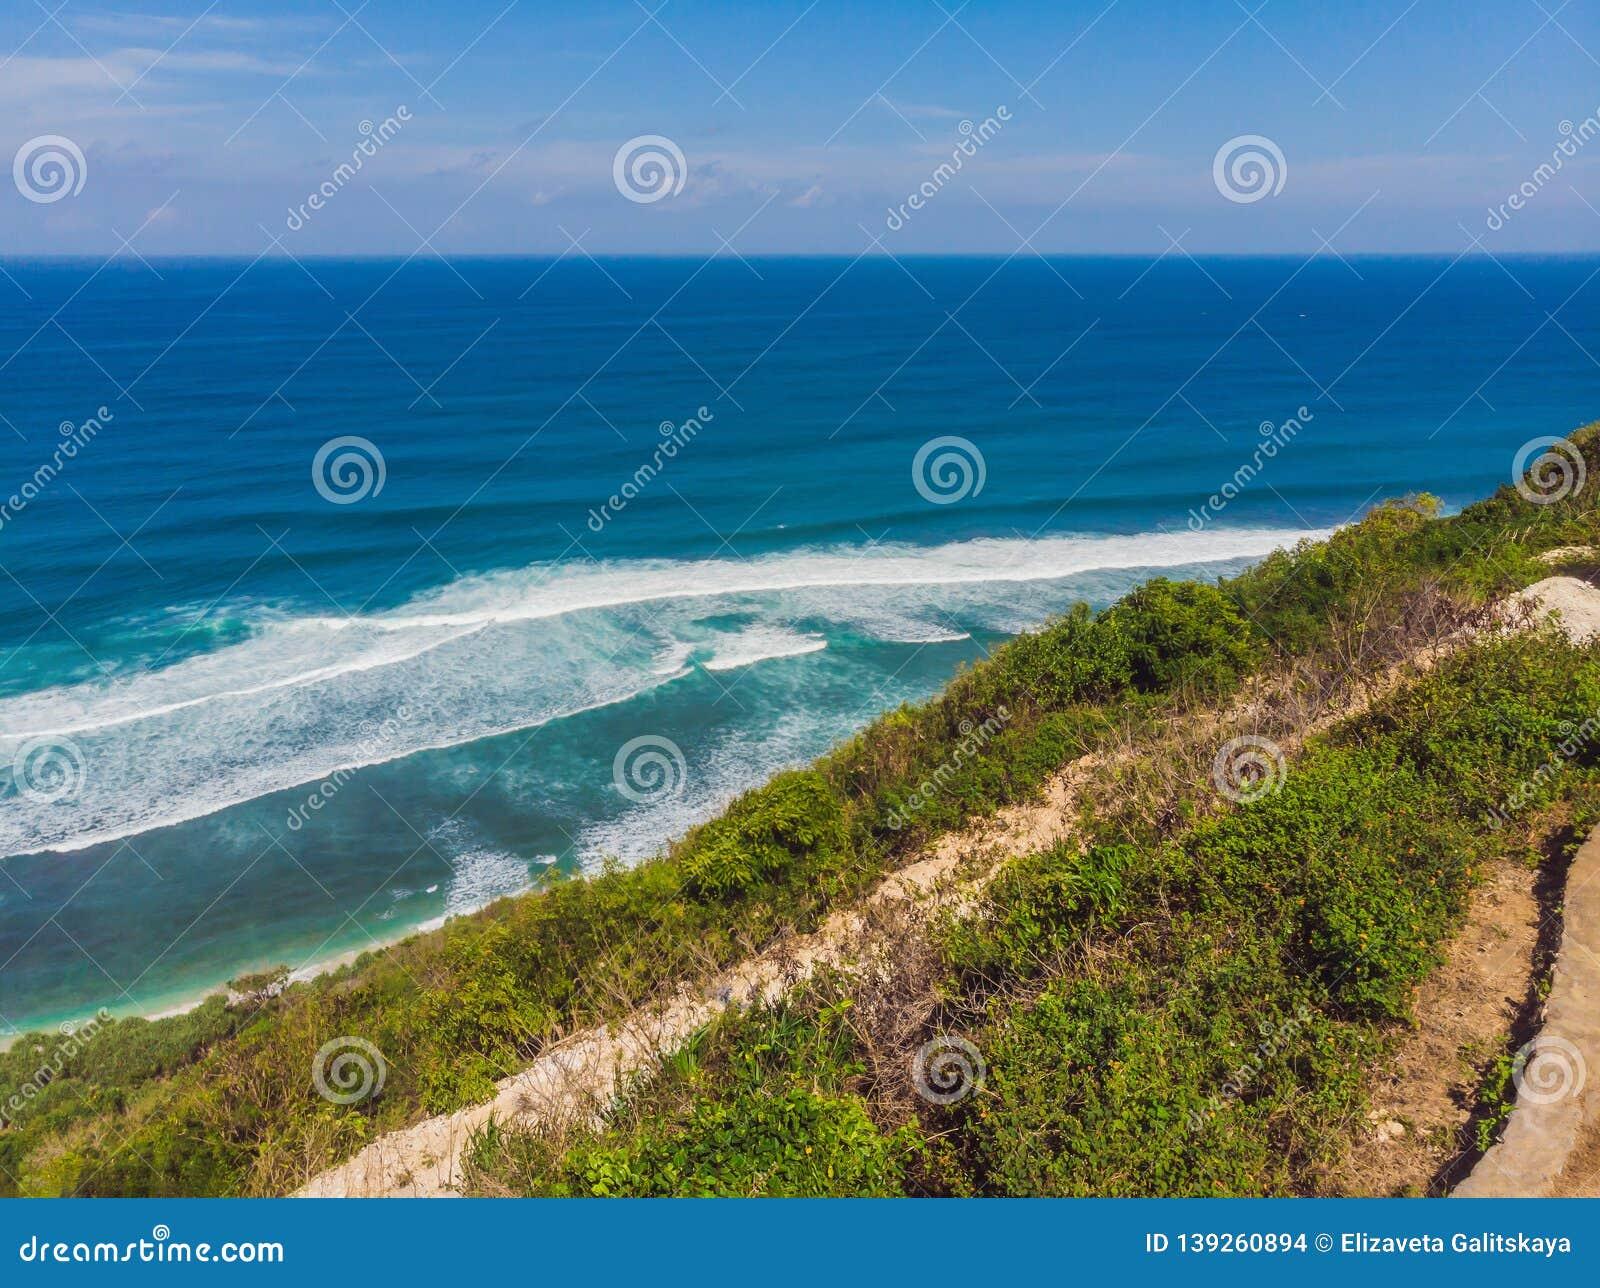 Top Aerial View Of Beauty Bali Beach Empty Paradise Beach Blue Sea